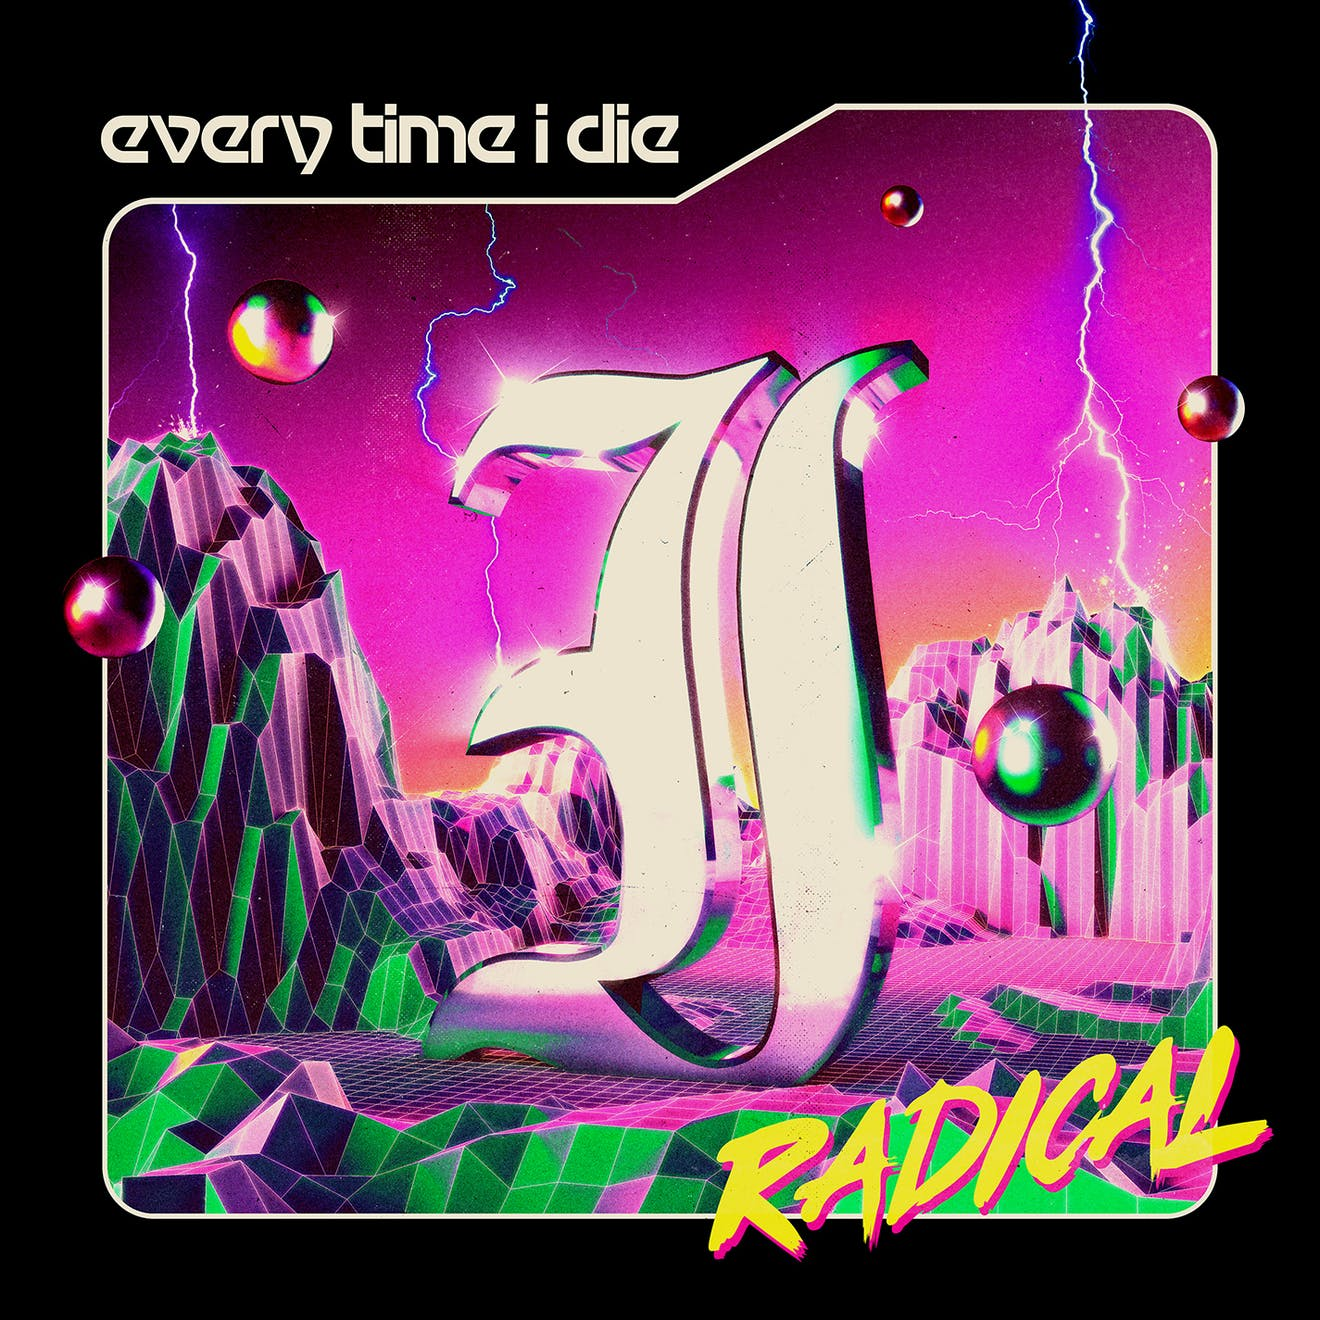 every time i die radical